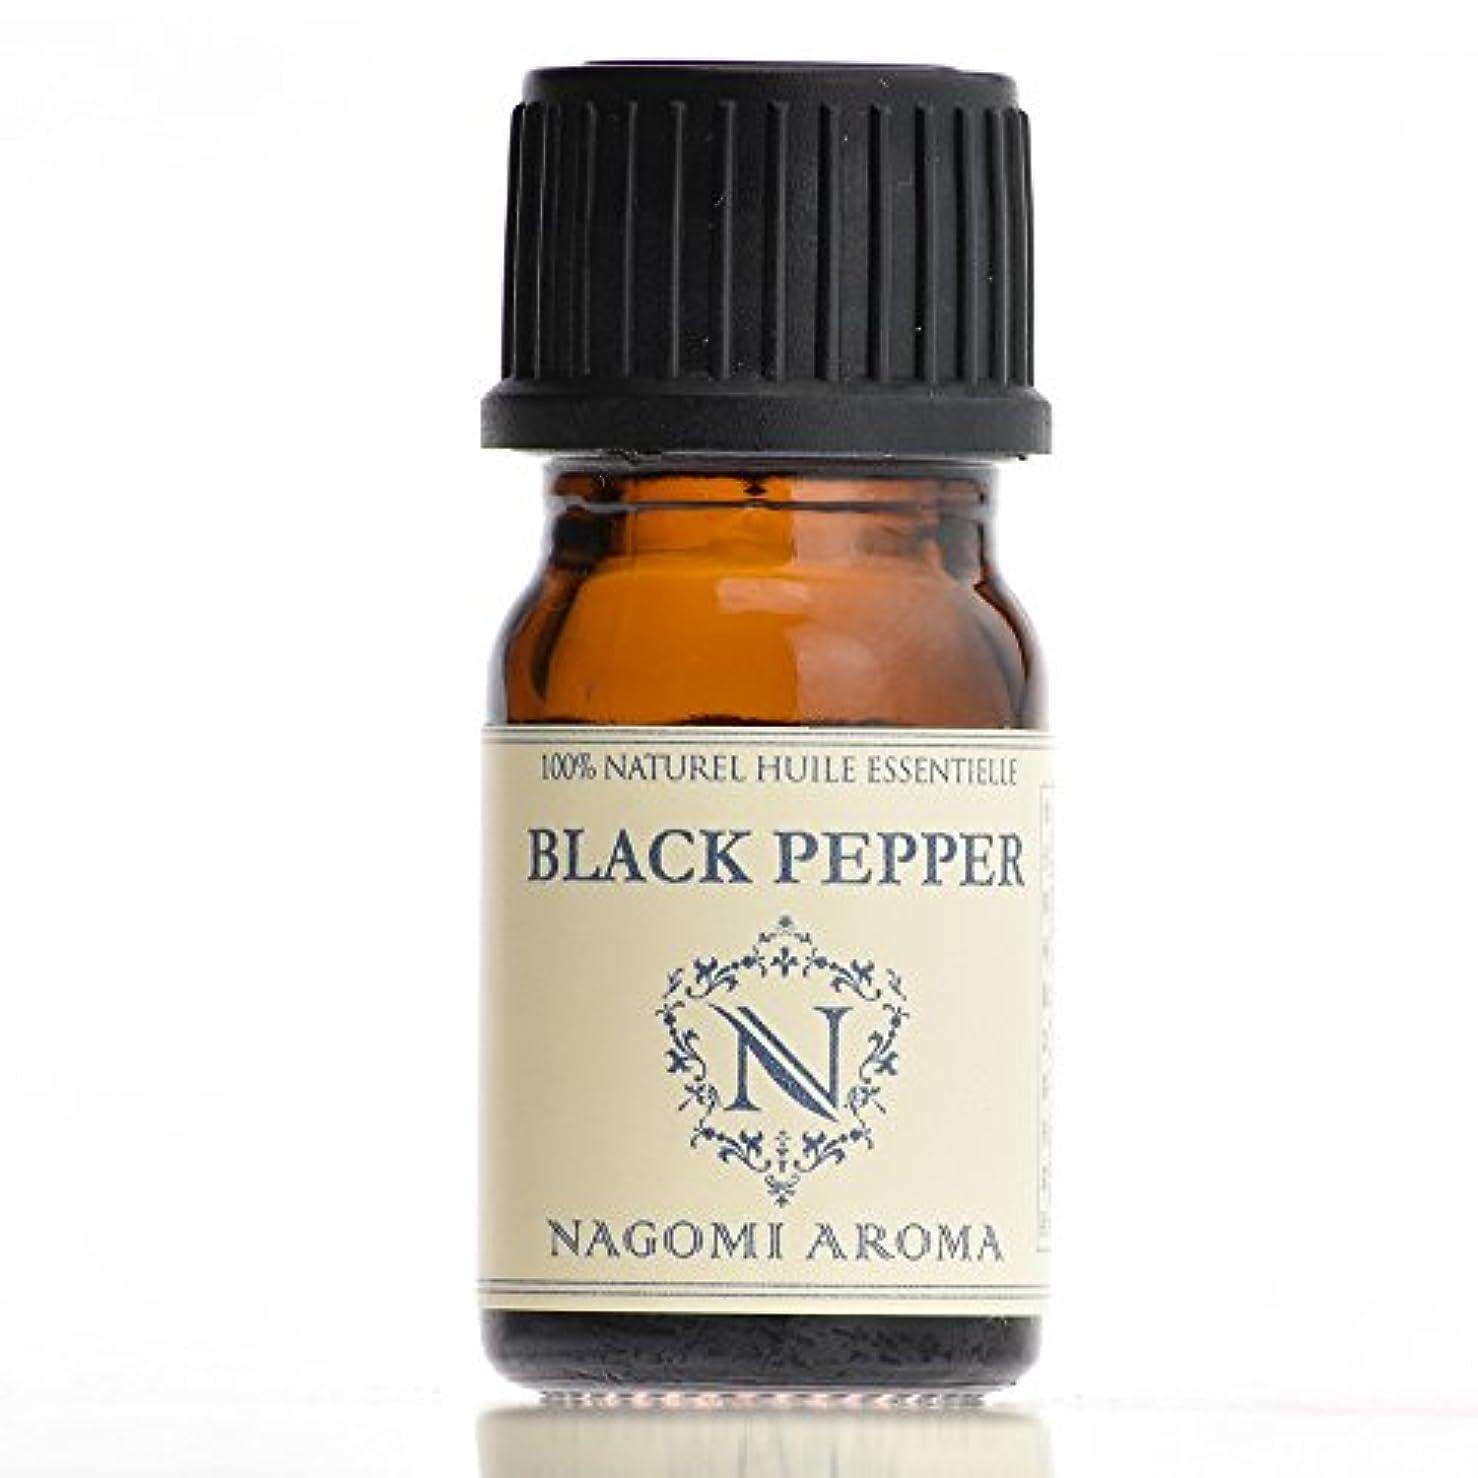 【AEAJ認定表示基準認定精油】NAGOMI PURE ブラックペッパー 5ml 【エッセンシャルオイル】【精油】【アロマオイル】 CONVOIL